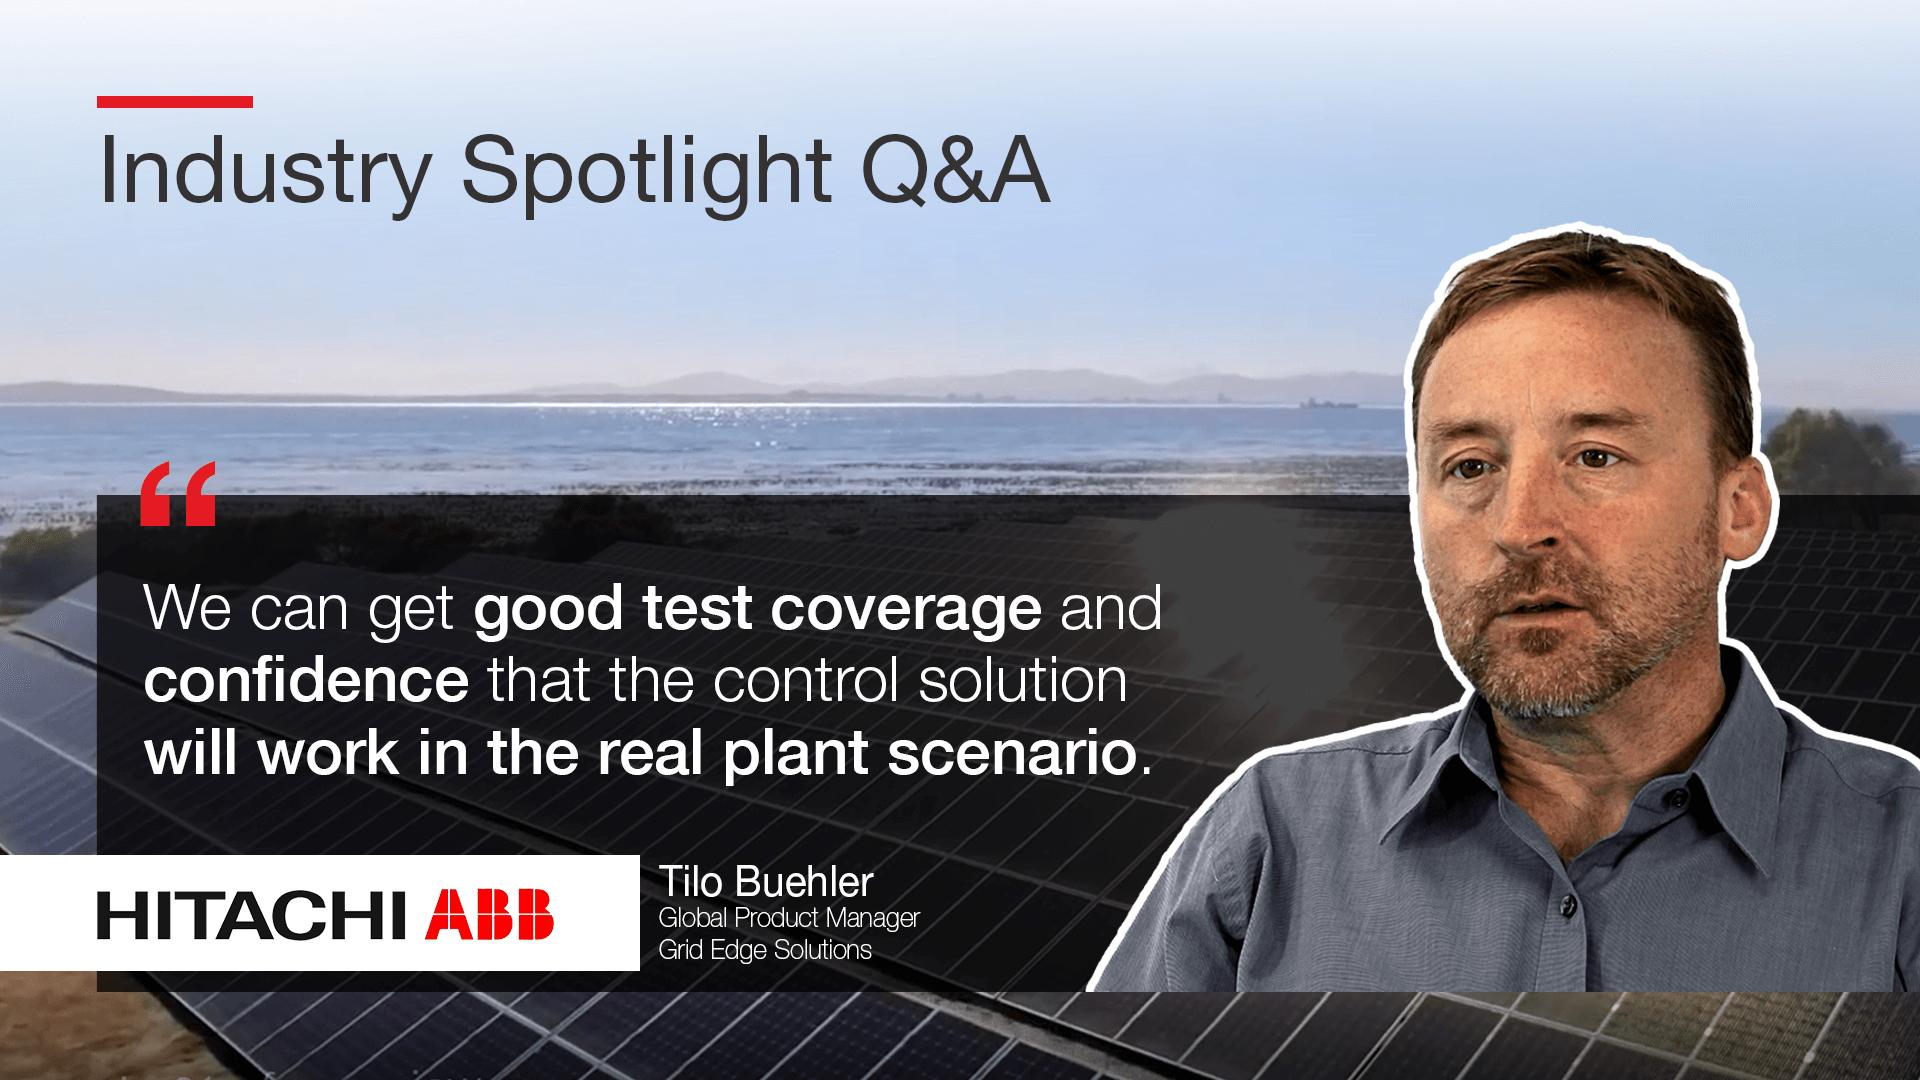 Spotlight Q&A - Hitachi ABB Power Grid (final)